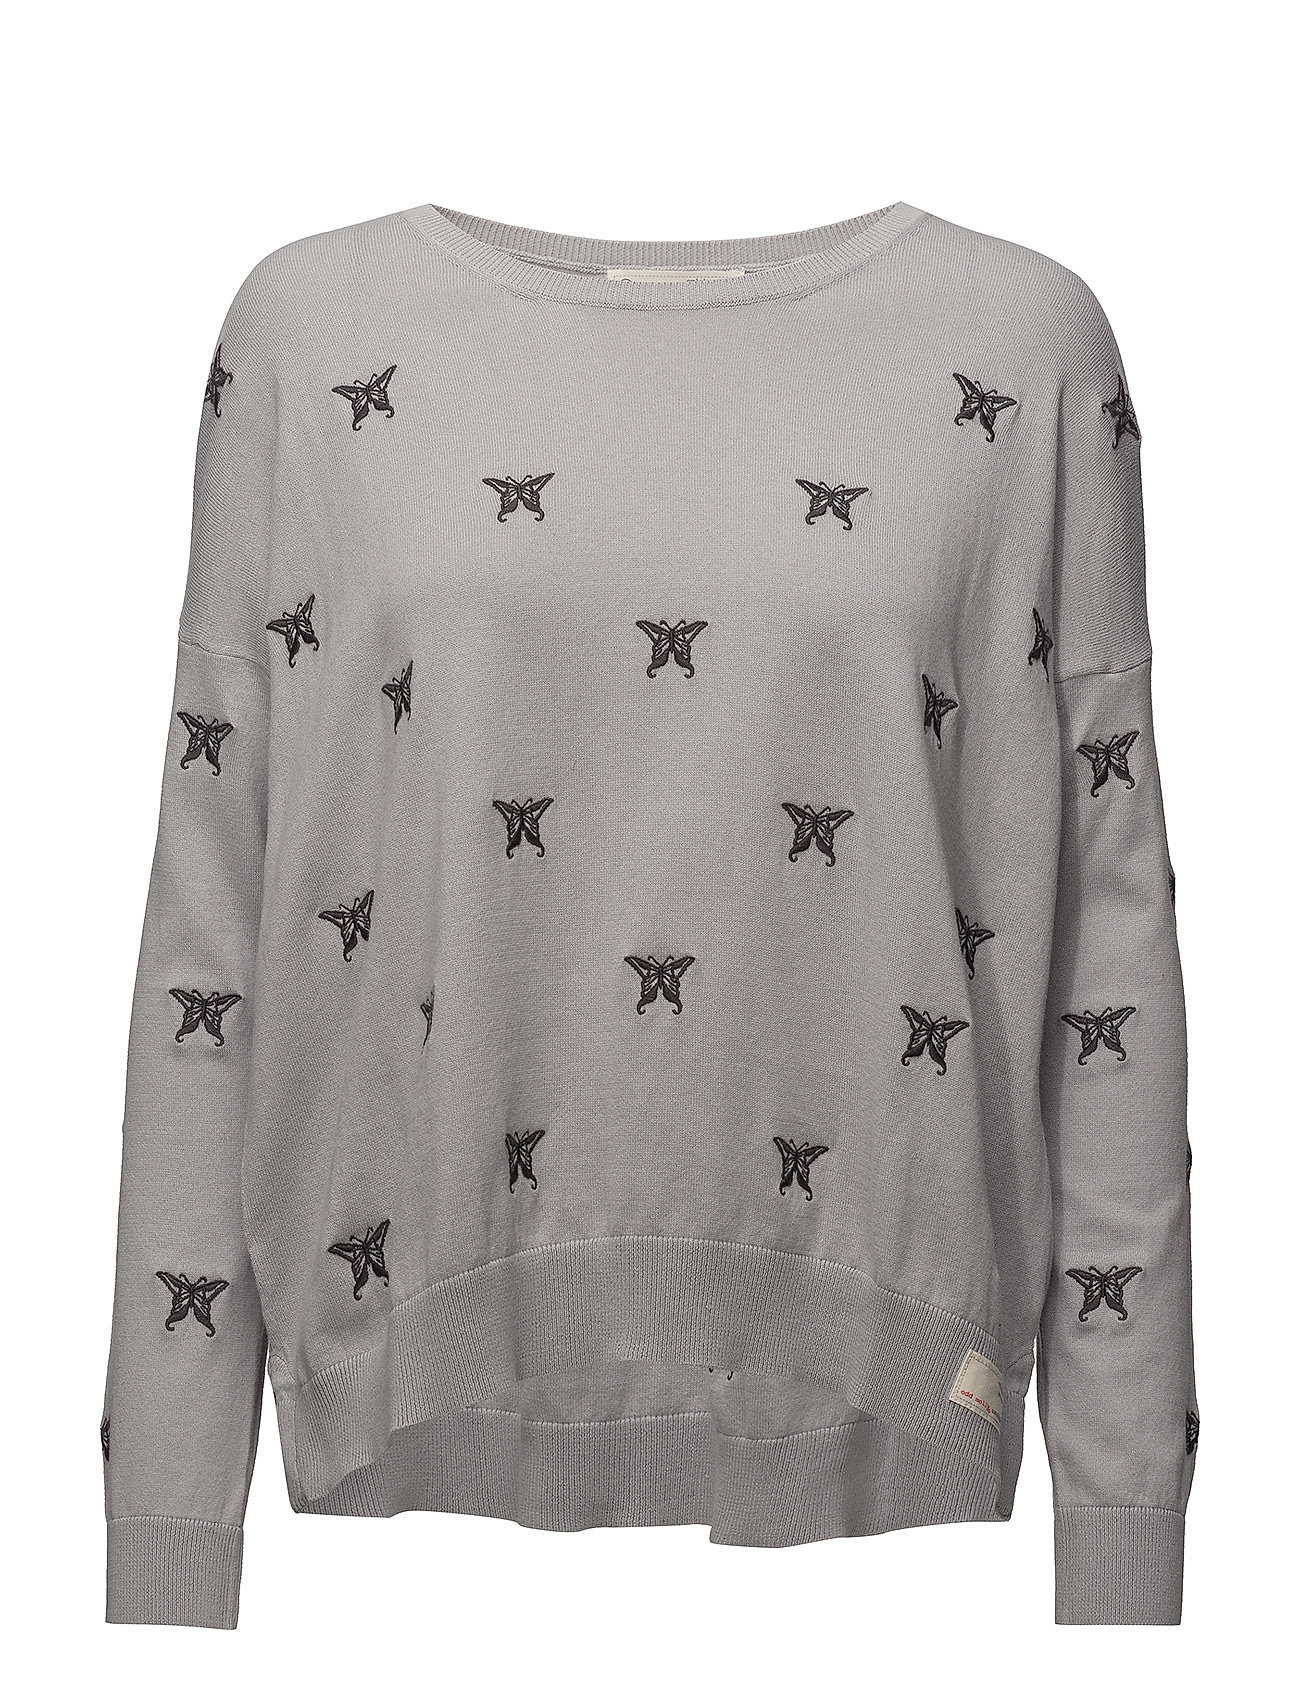 Happyness Sweater - ODD MOLLY